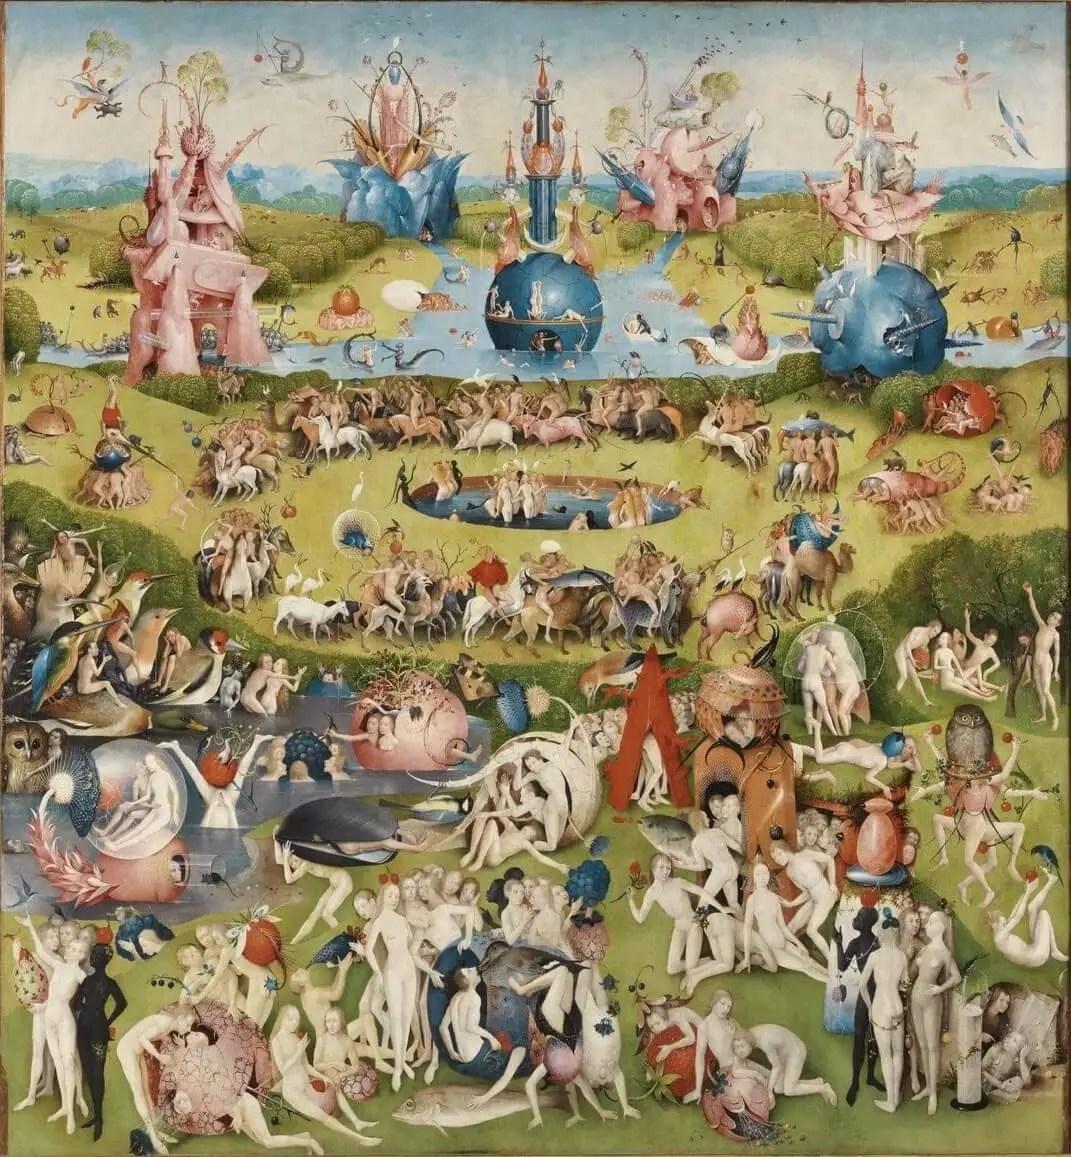 Босх центральная часть триптиха